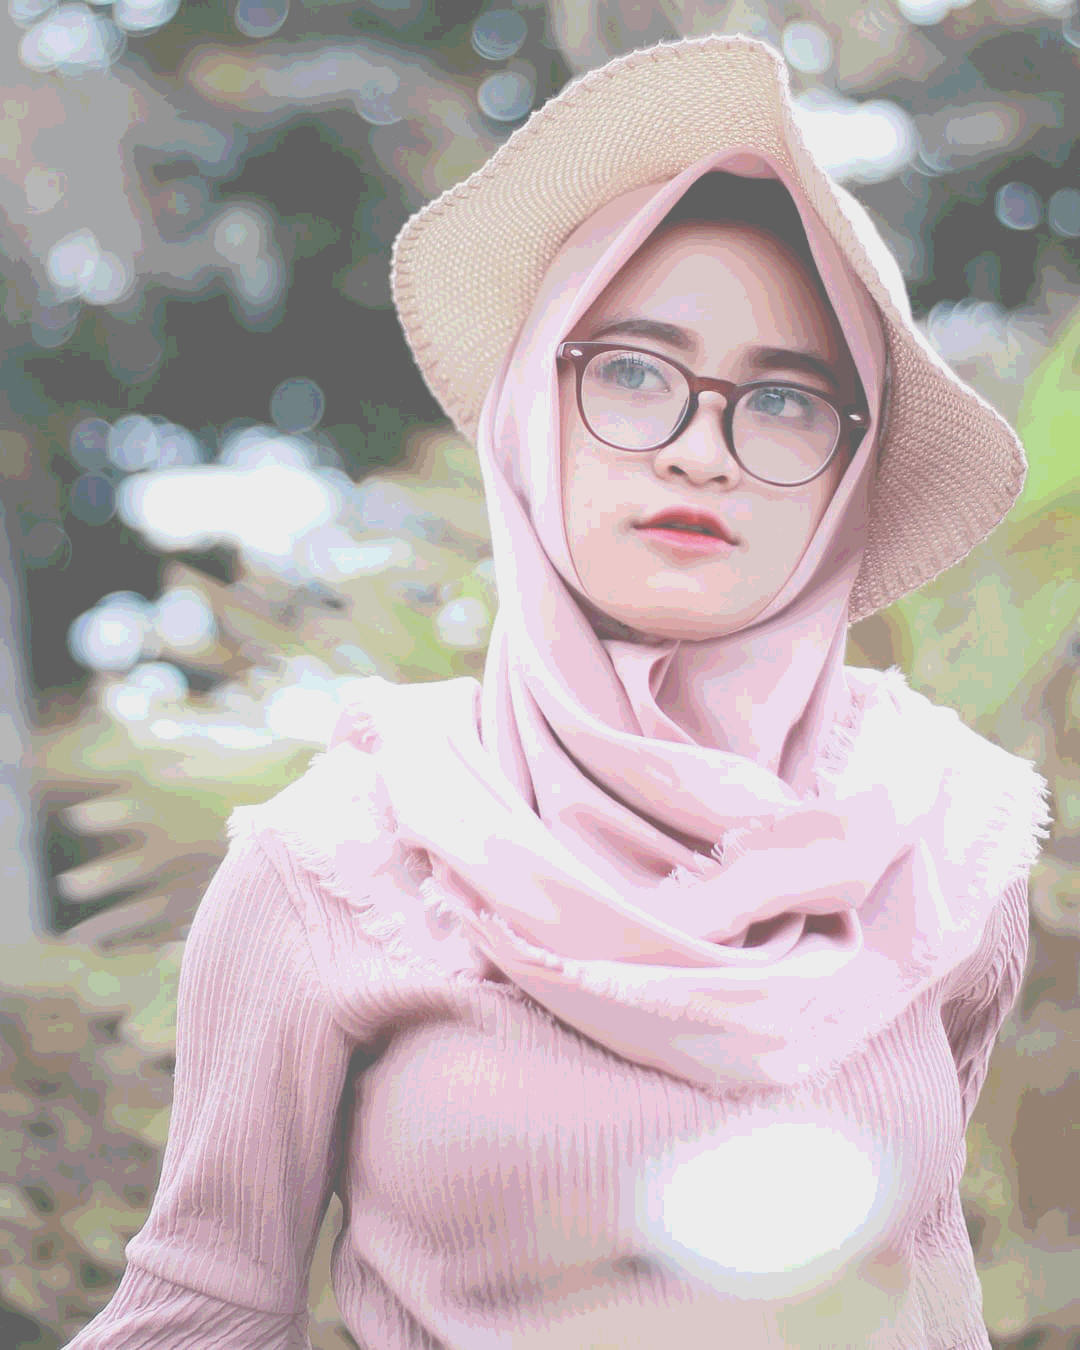 Posterize Keren Dengan Solid Color Adobe Photoshop CC 2019 - MaudySites